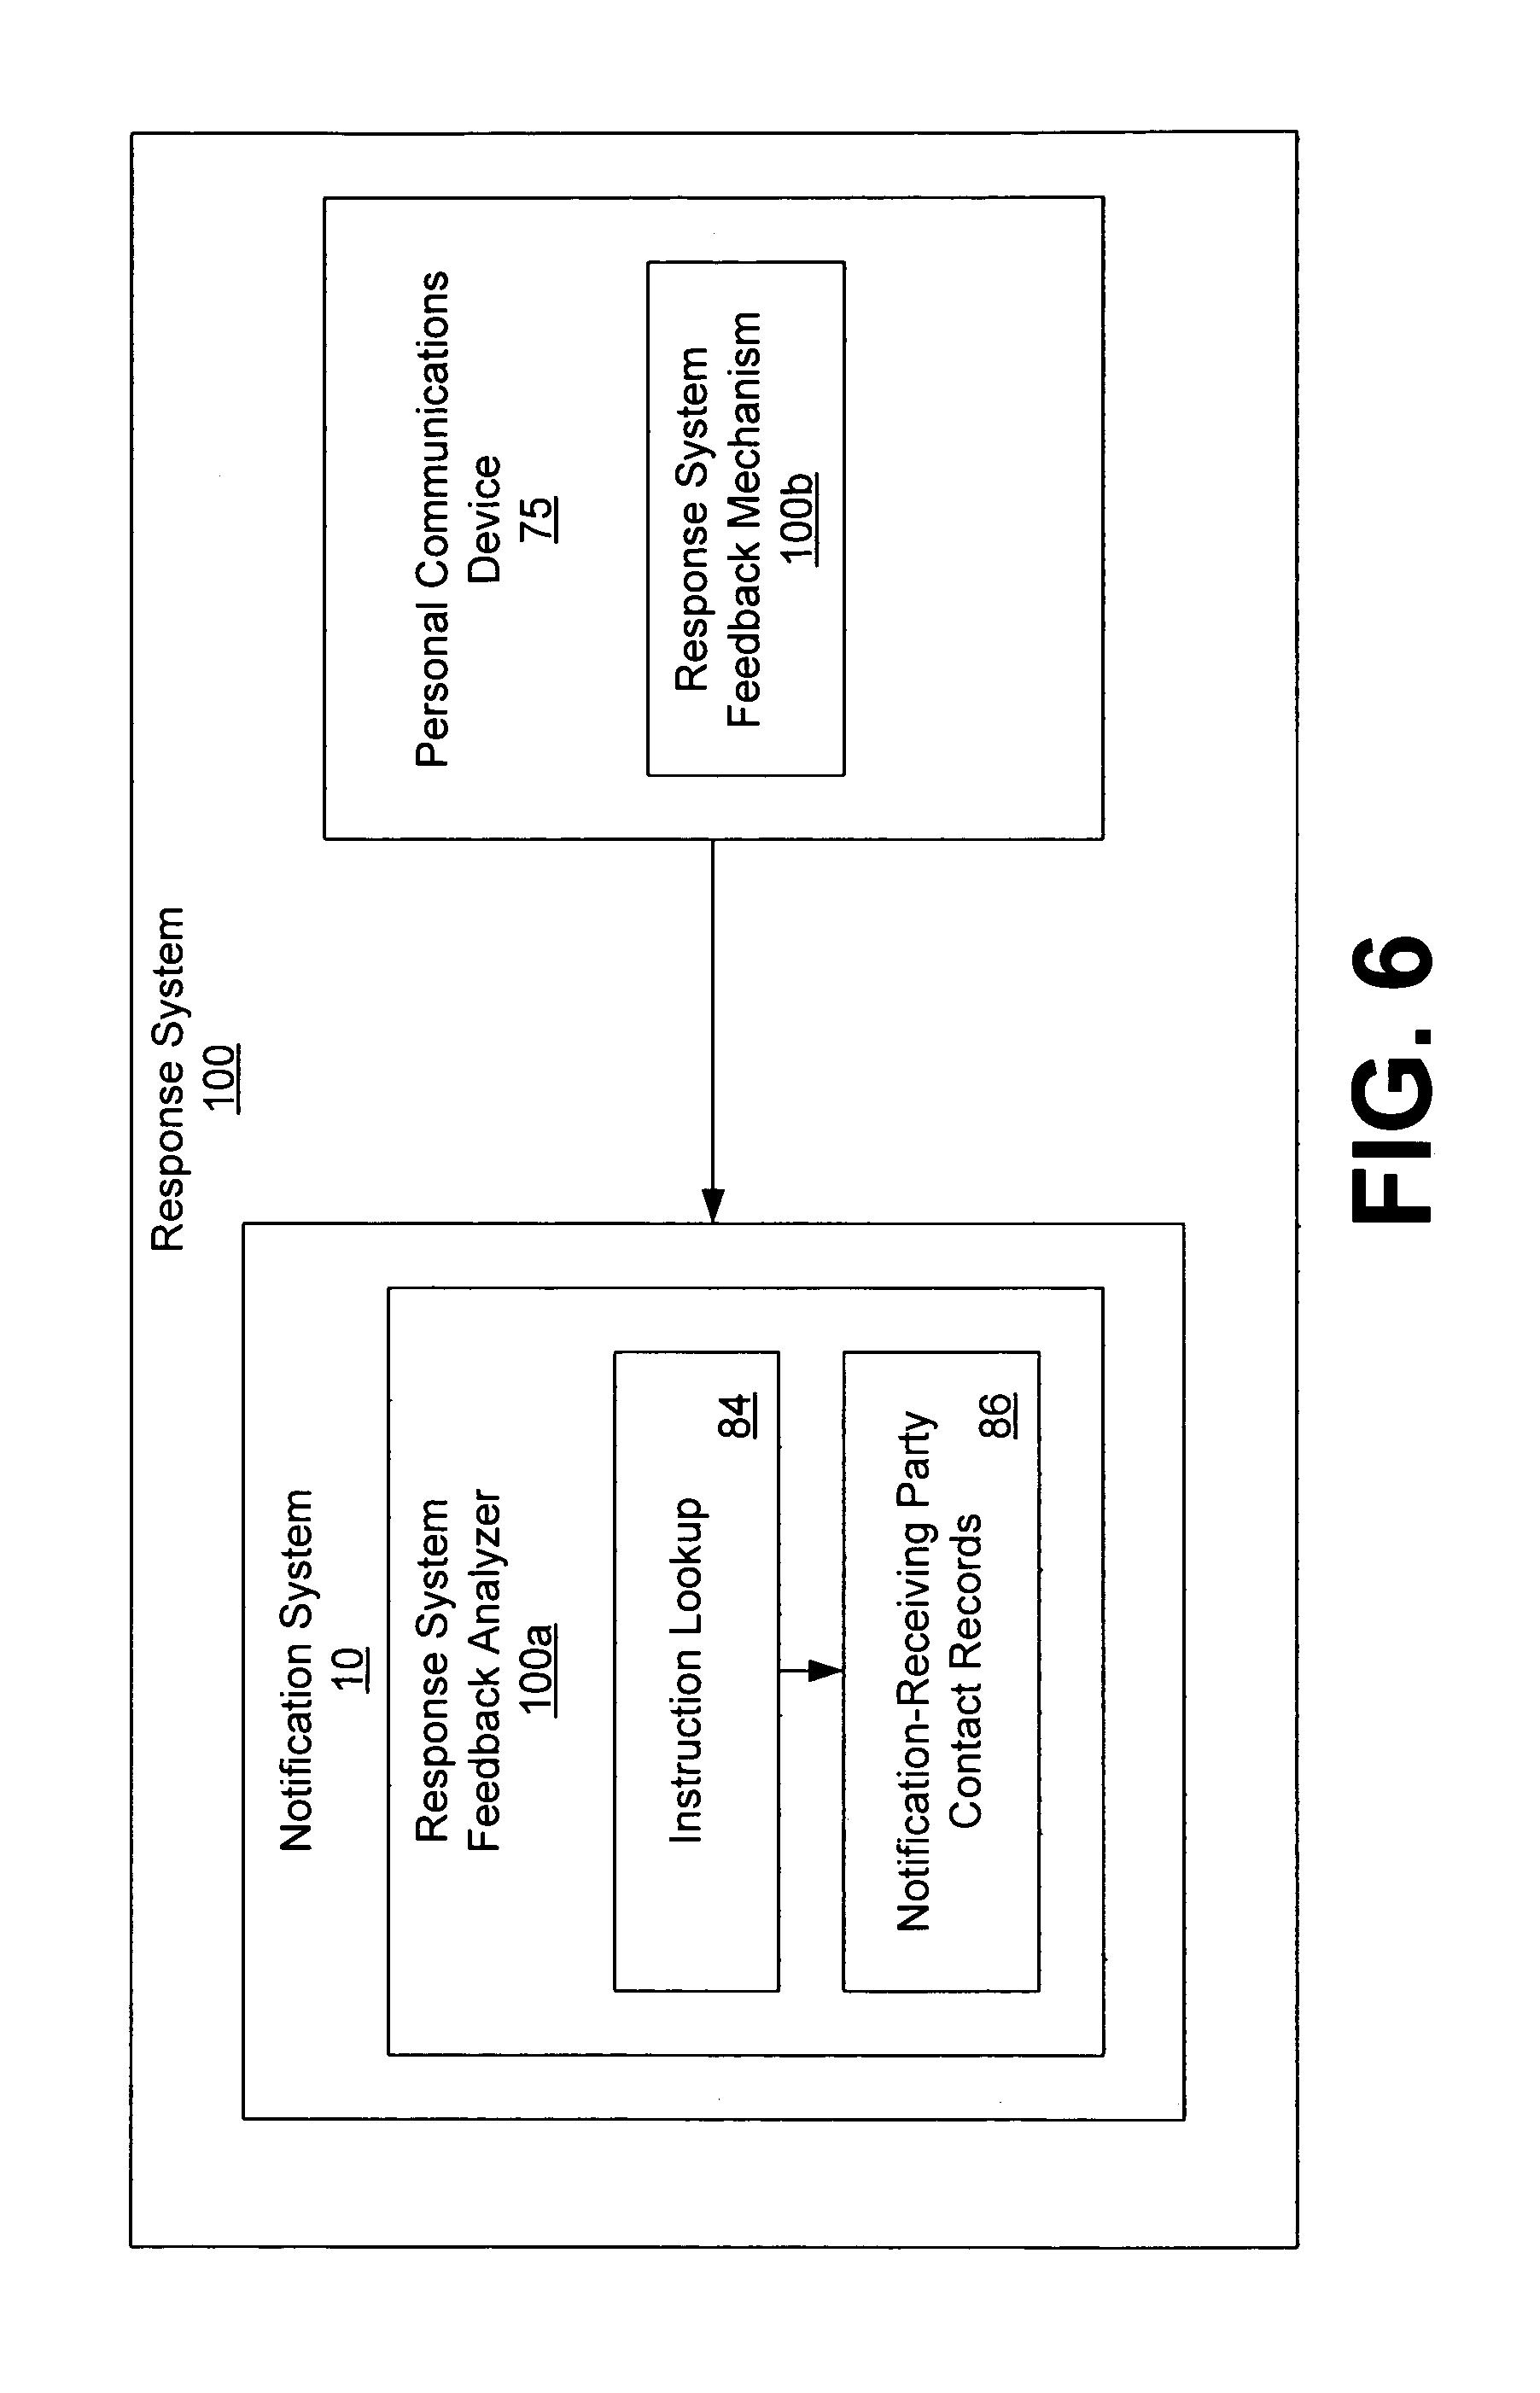 Patent US 7,482,952 B2